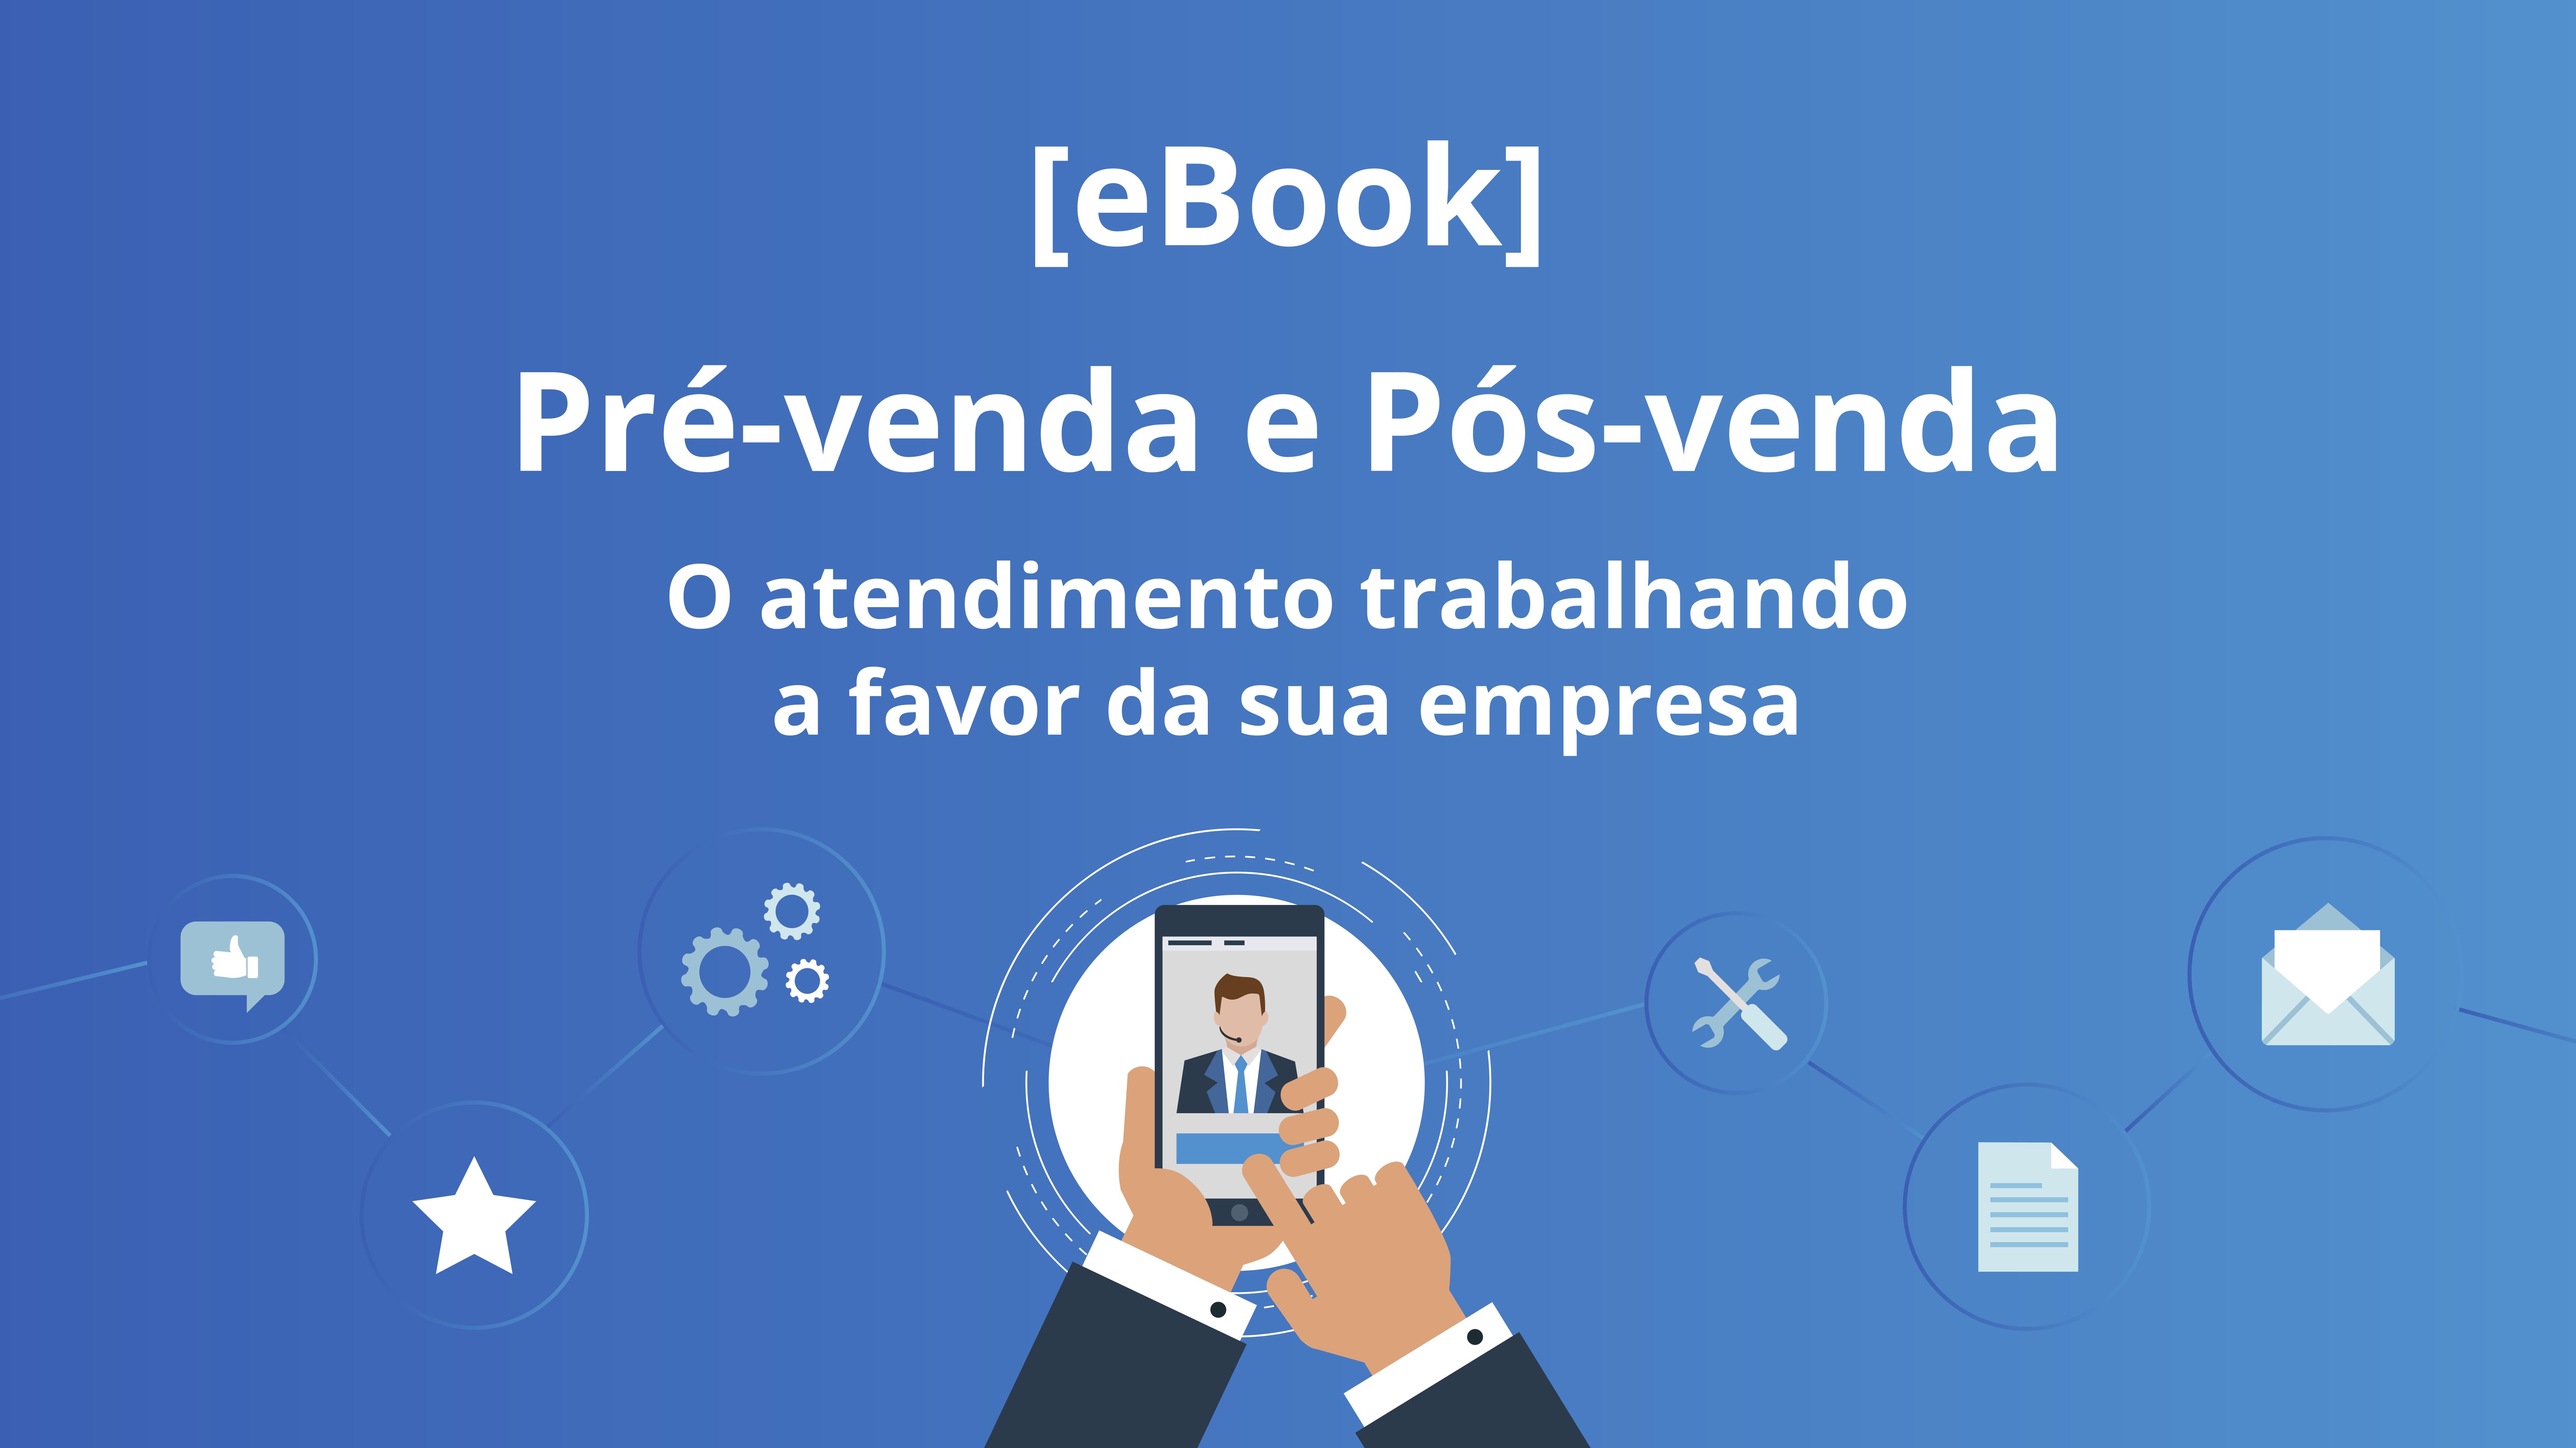 ebook-pre-venda